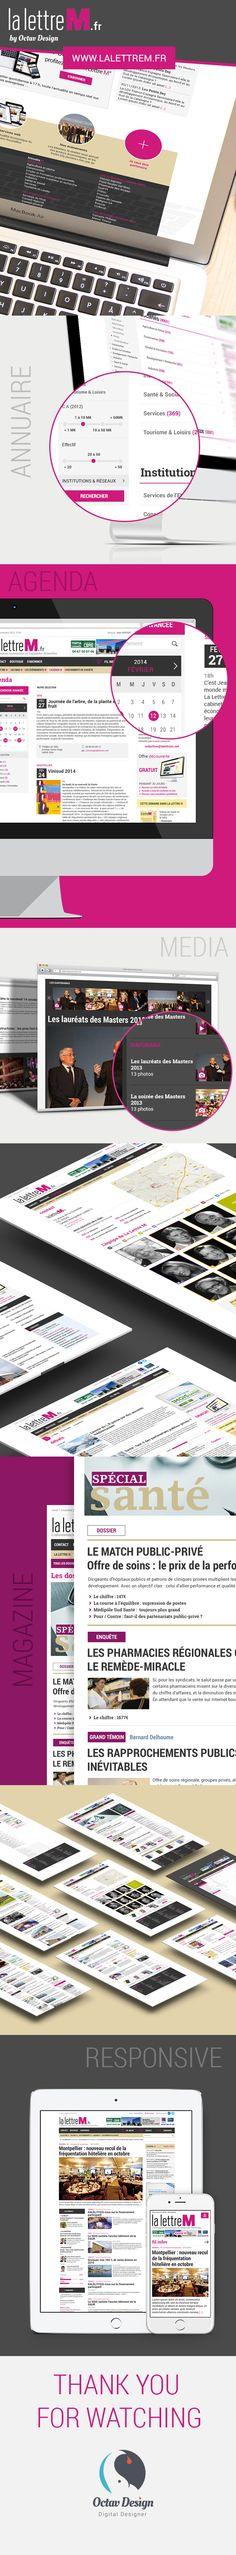 La lettre M webdesign #webdesign #responsive  #iphone #app #interface #flatdesign #menu #ux #ui #design #press